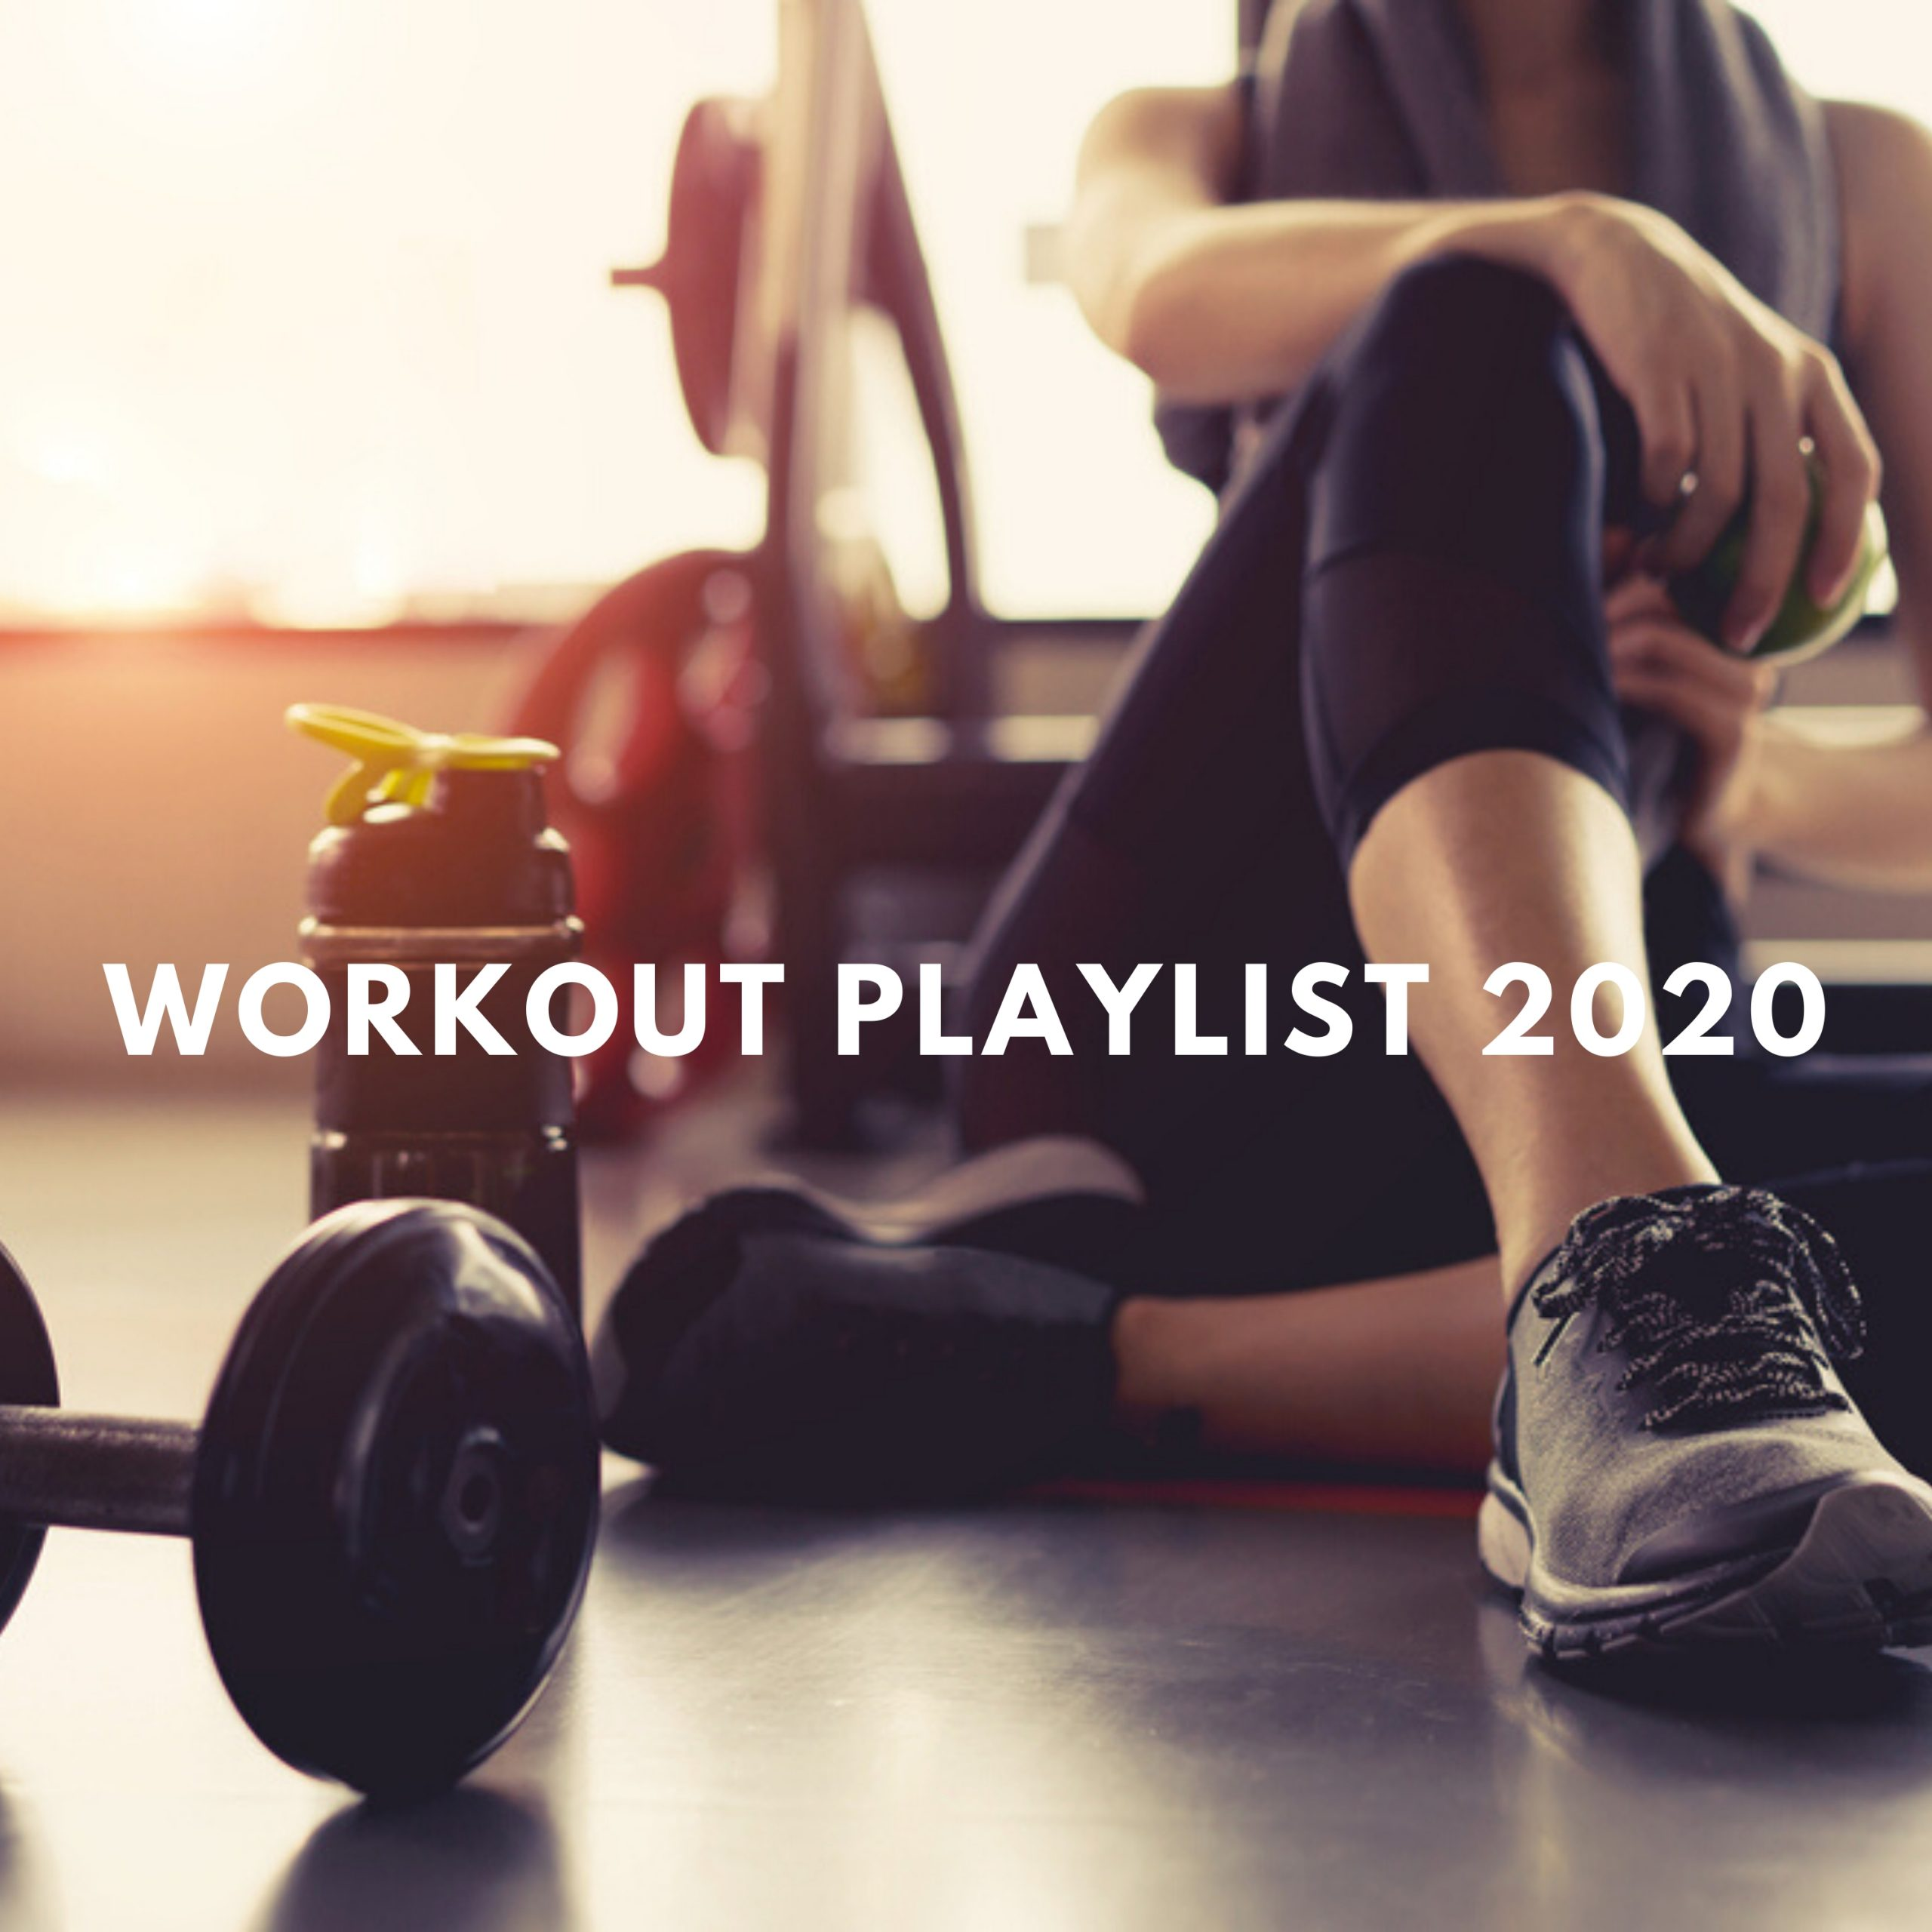 Workout Playlist 2020